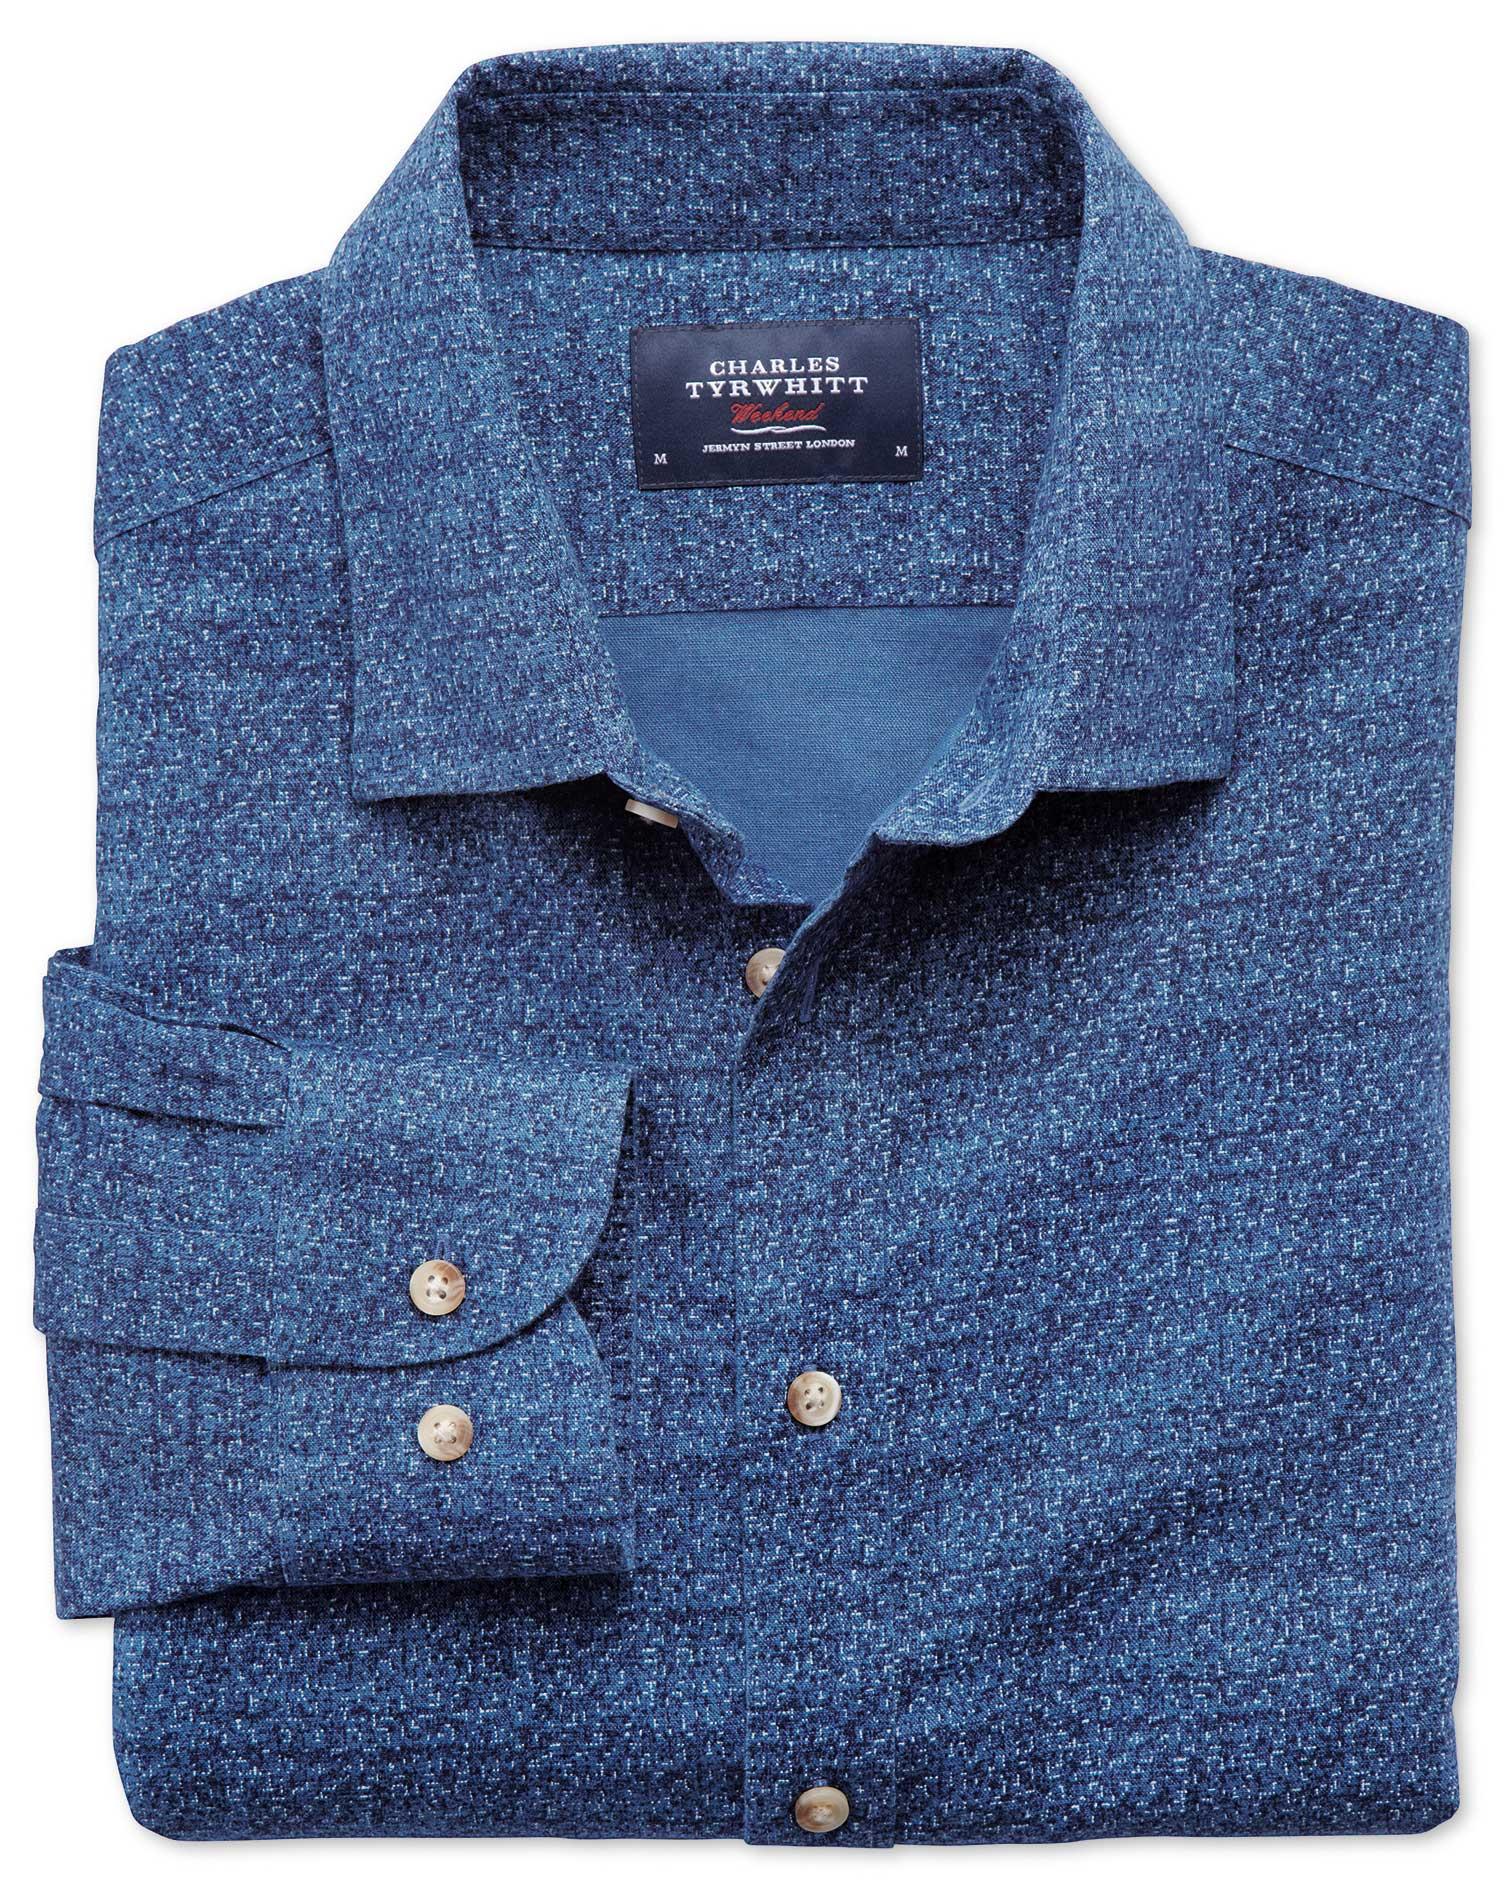 Extra Slim Fit Blue Print Shirt Charles Tyrwhitt